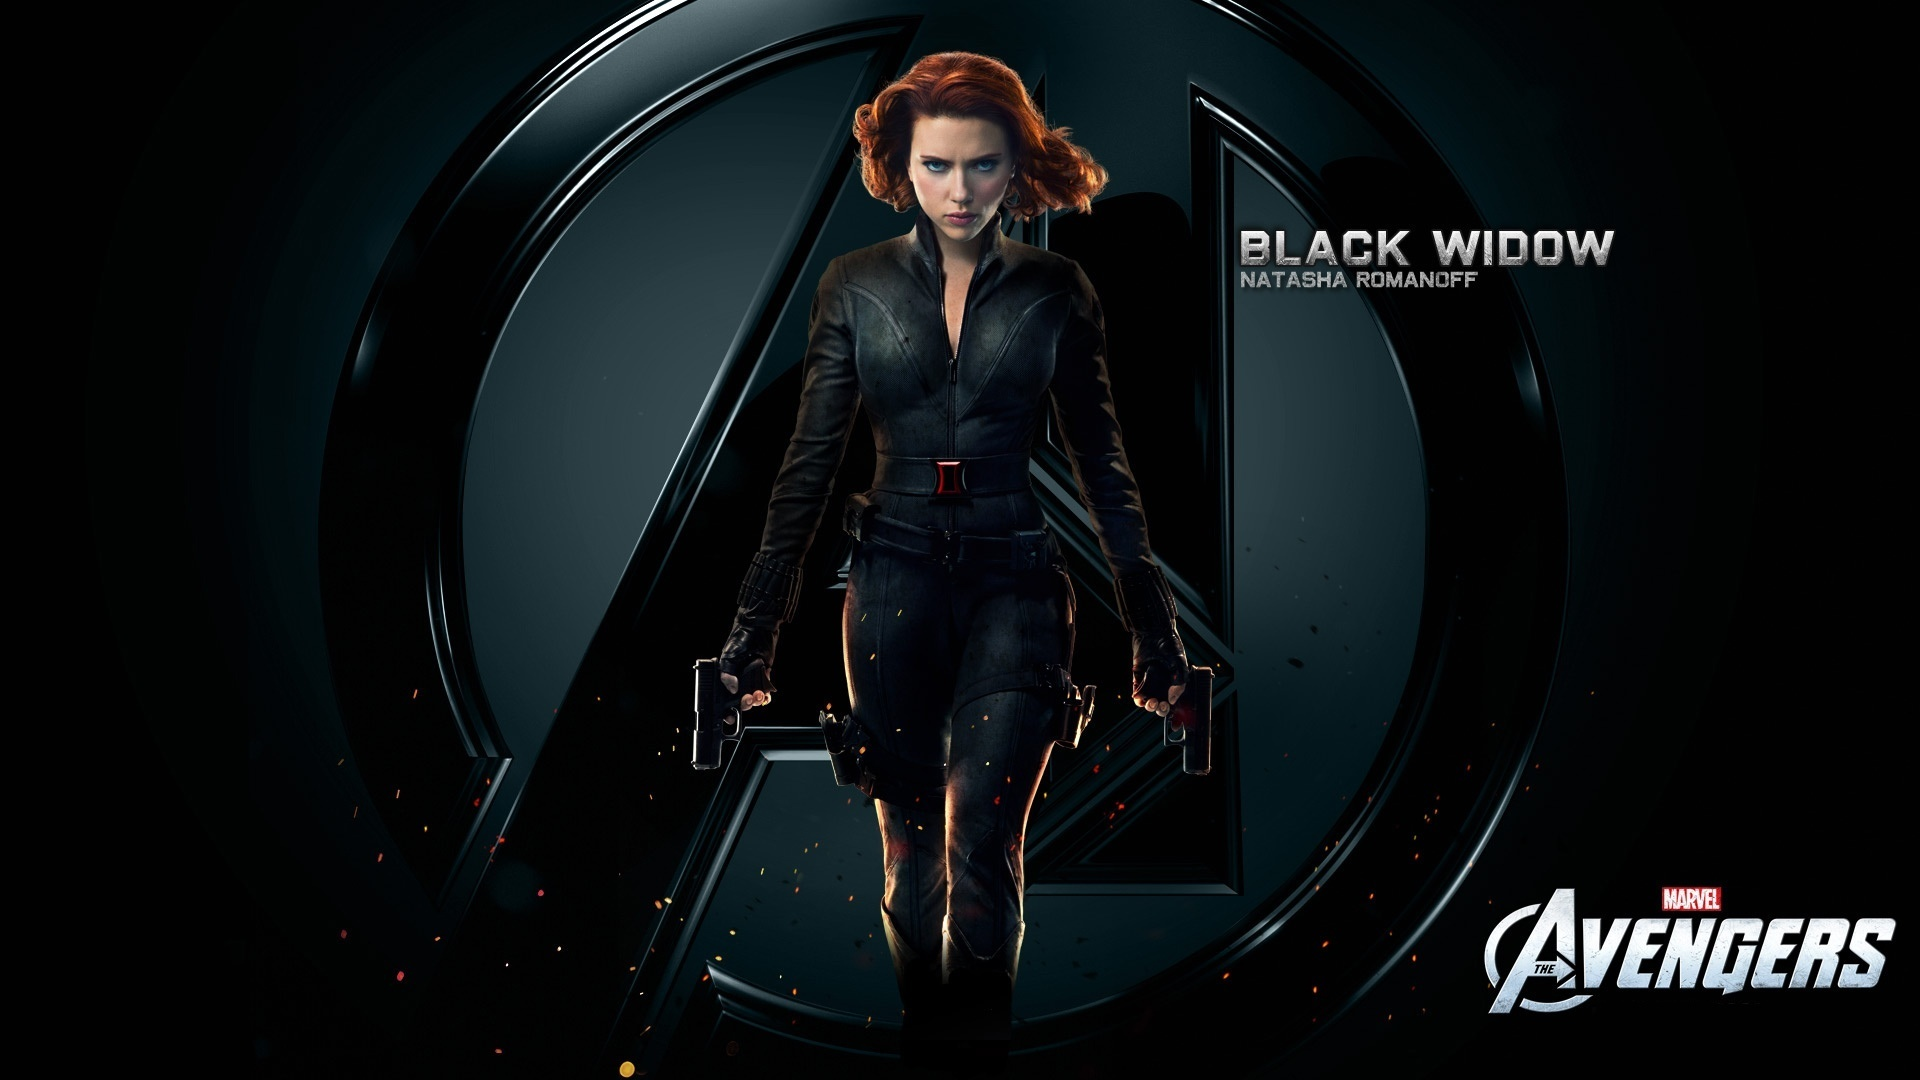 Fotos Marvel's The Avengers 2012 Scarlett Johansson BLACK WIDOW Film